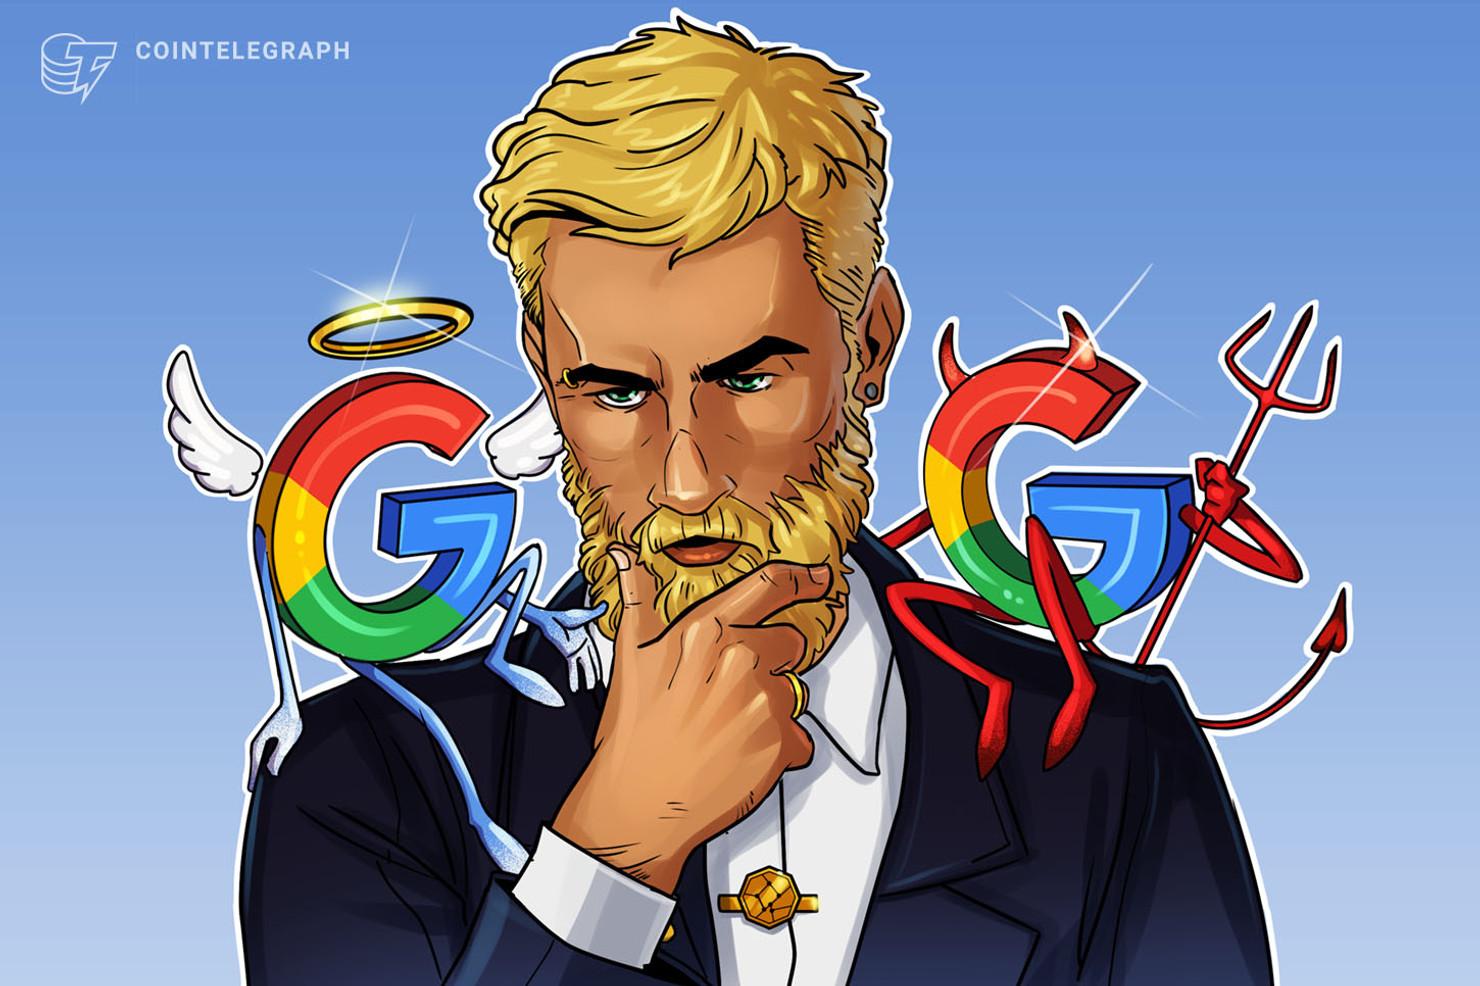 #Forkgoogle: Crypto Community Pushes Back Against Censorship